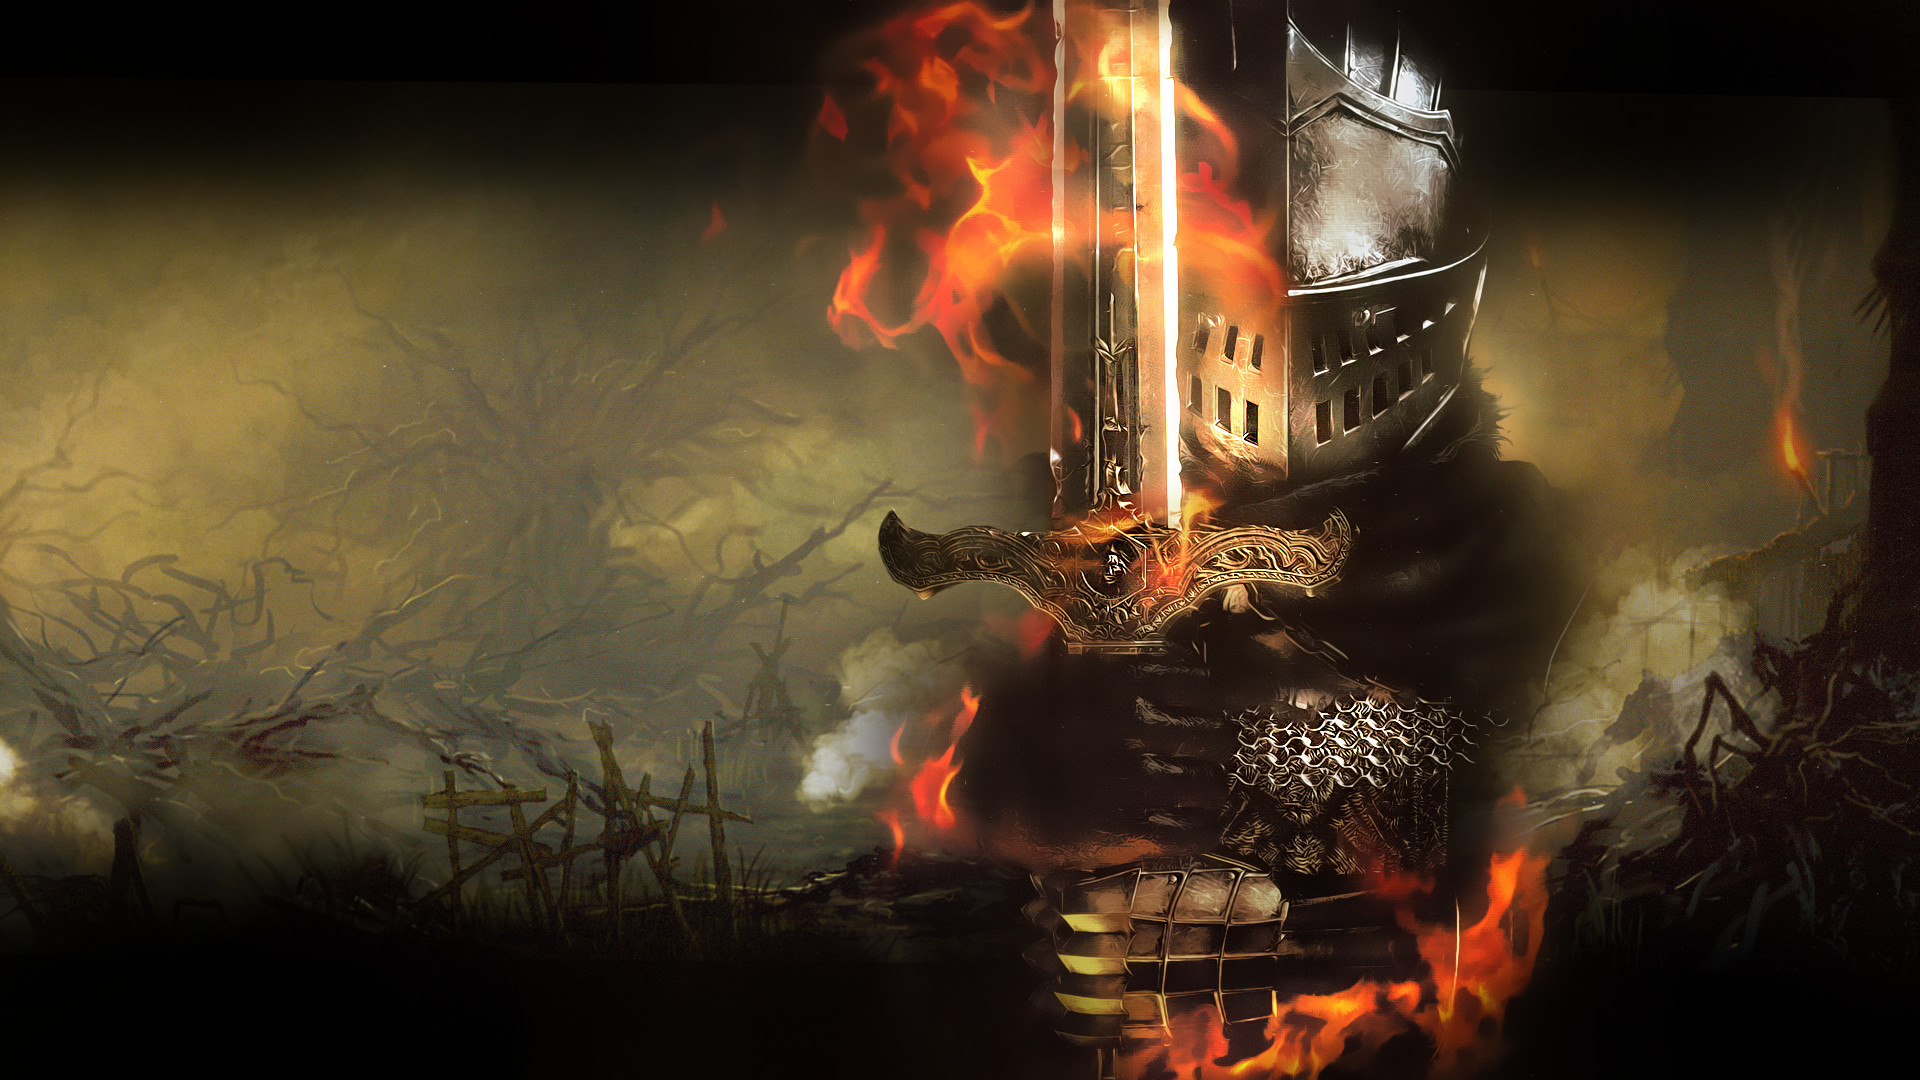 Dark Souls 3 Wallpaper Dark Souls 3 Widescreen Wallpaper